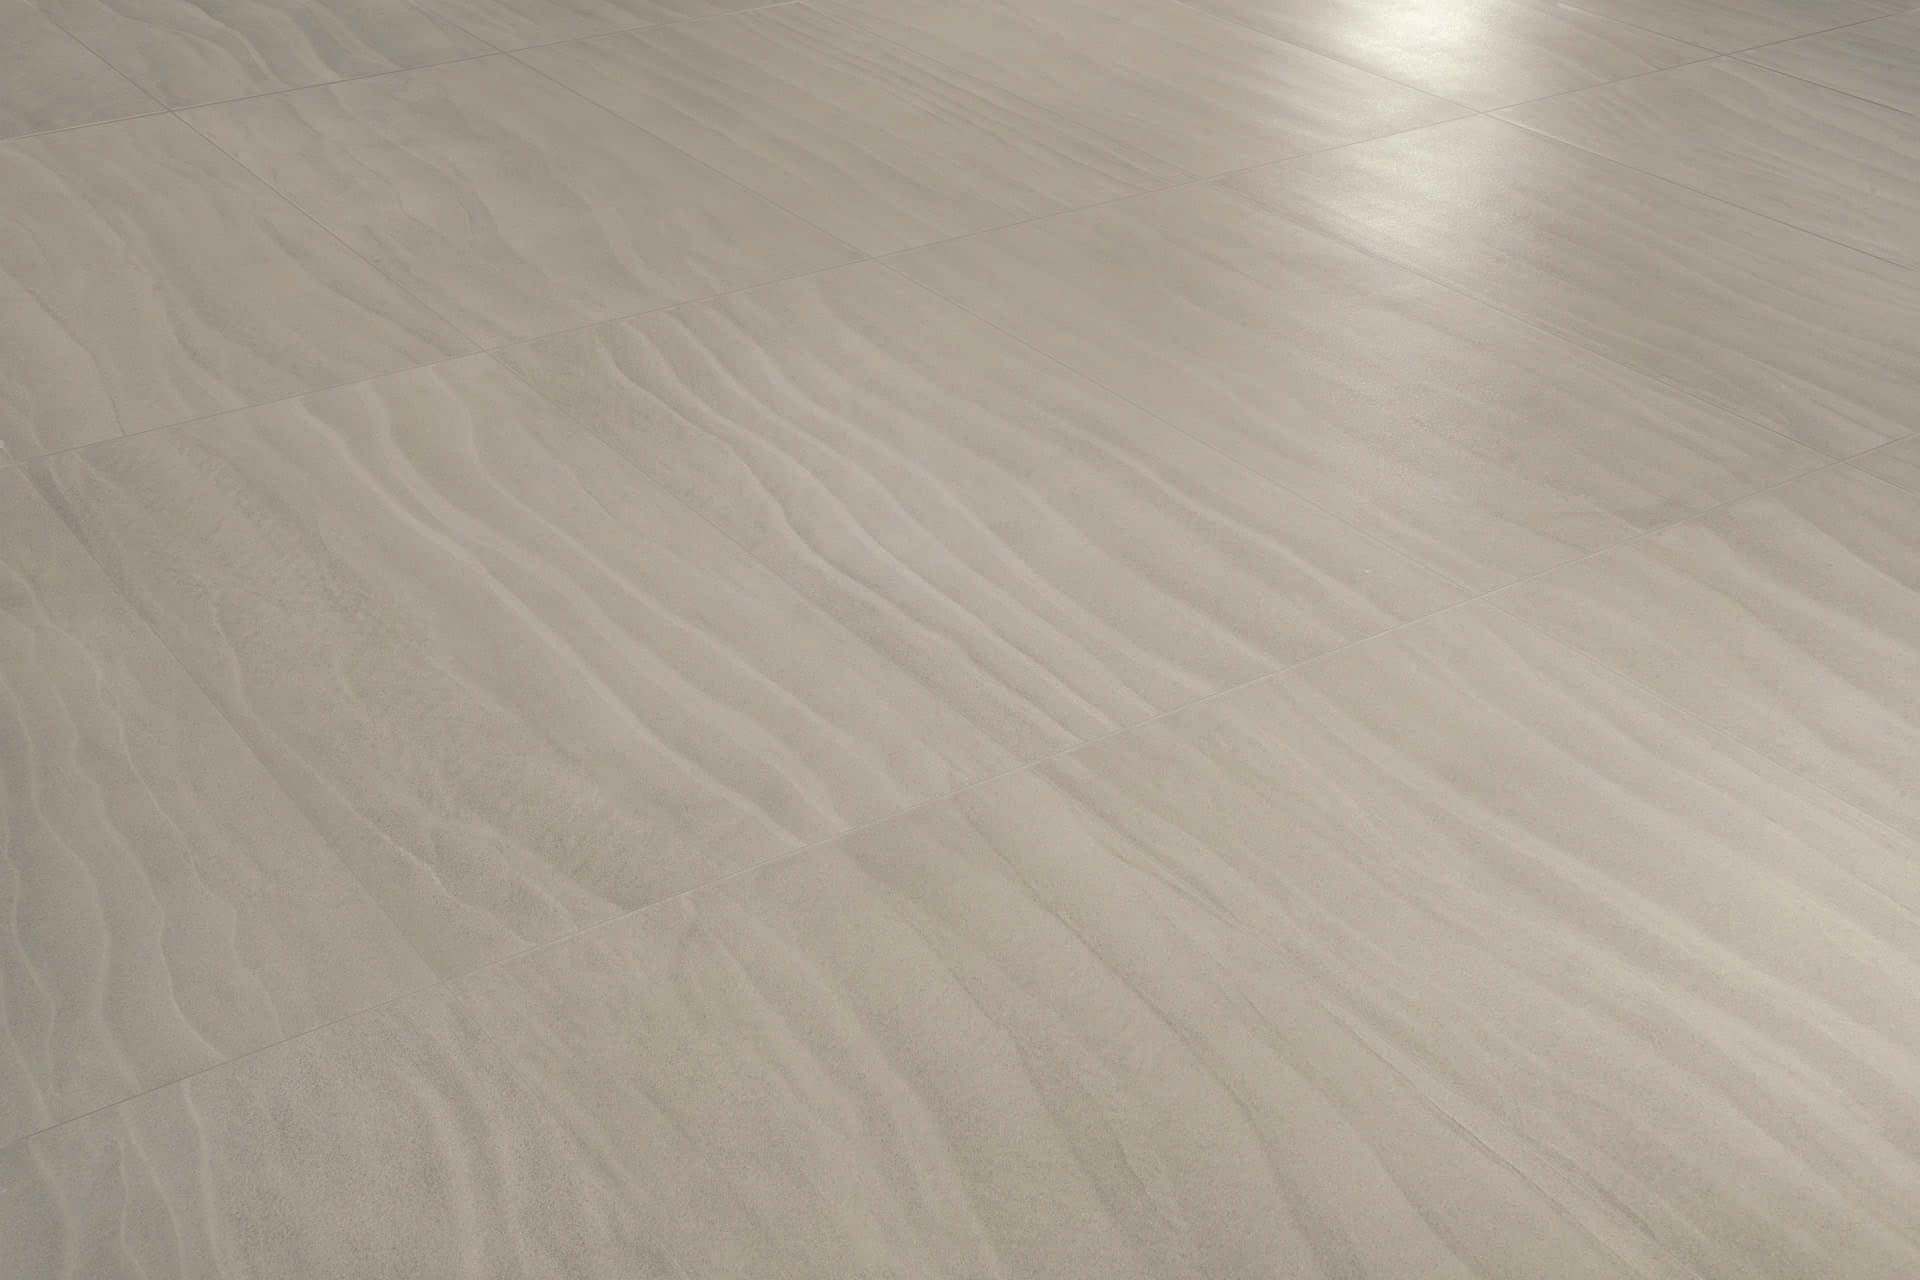 Zerodesign Sabbia Gobi Grey Naturale Pav